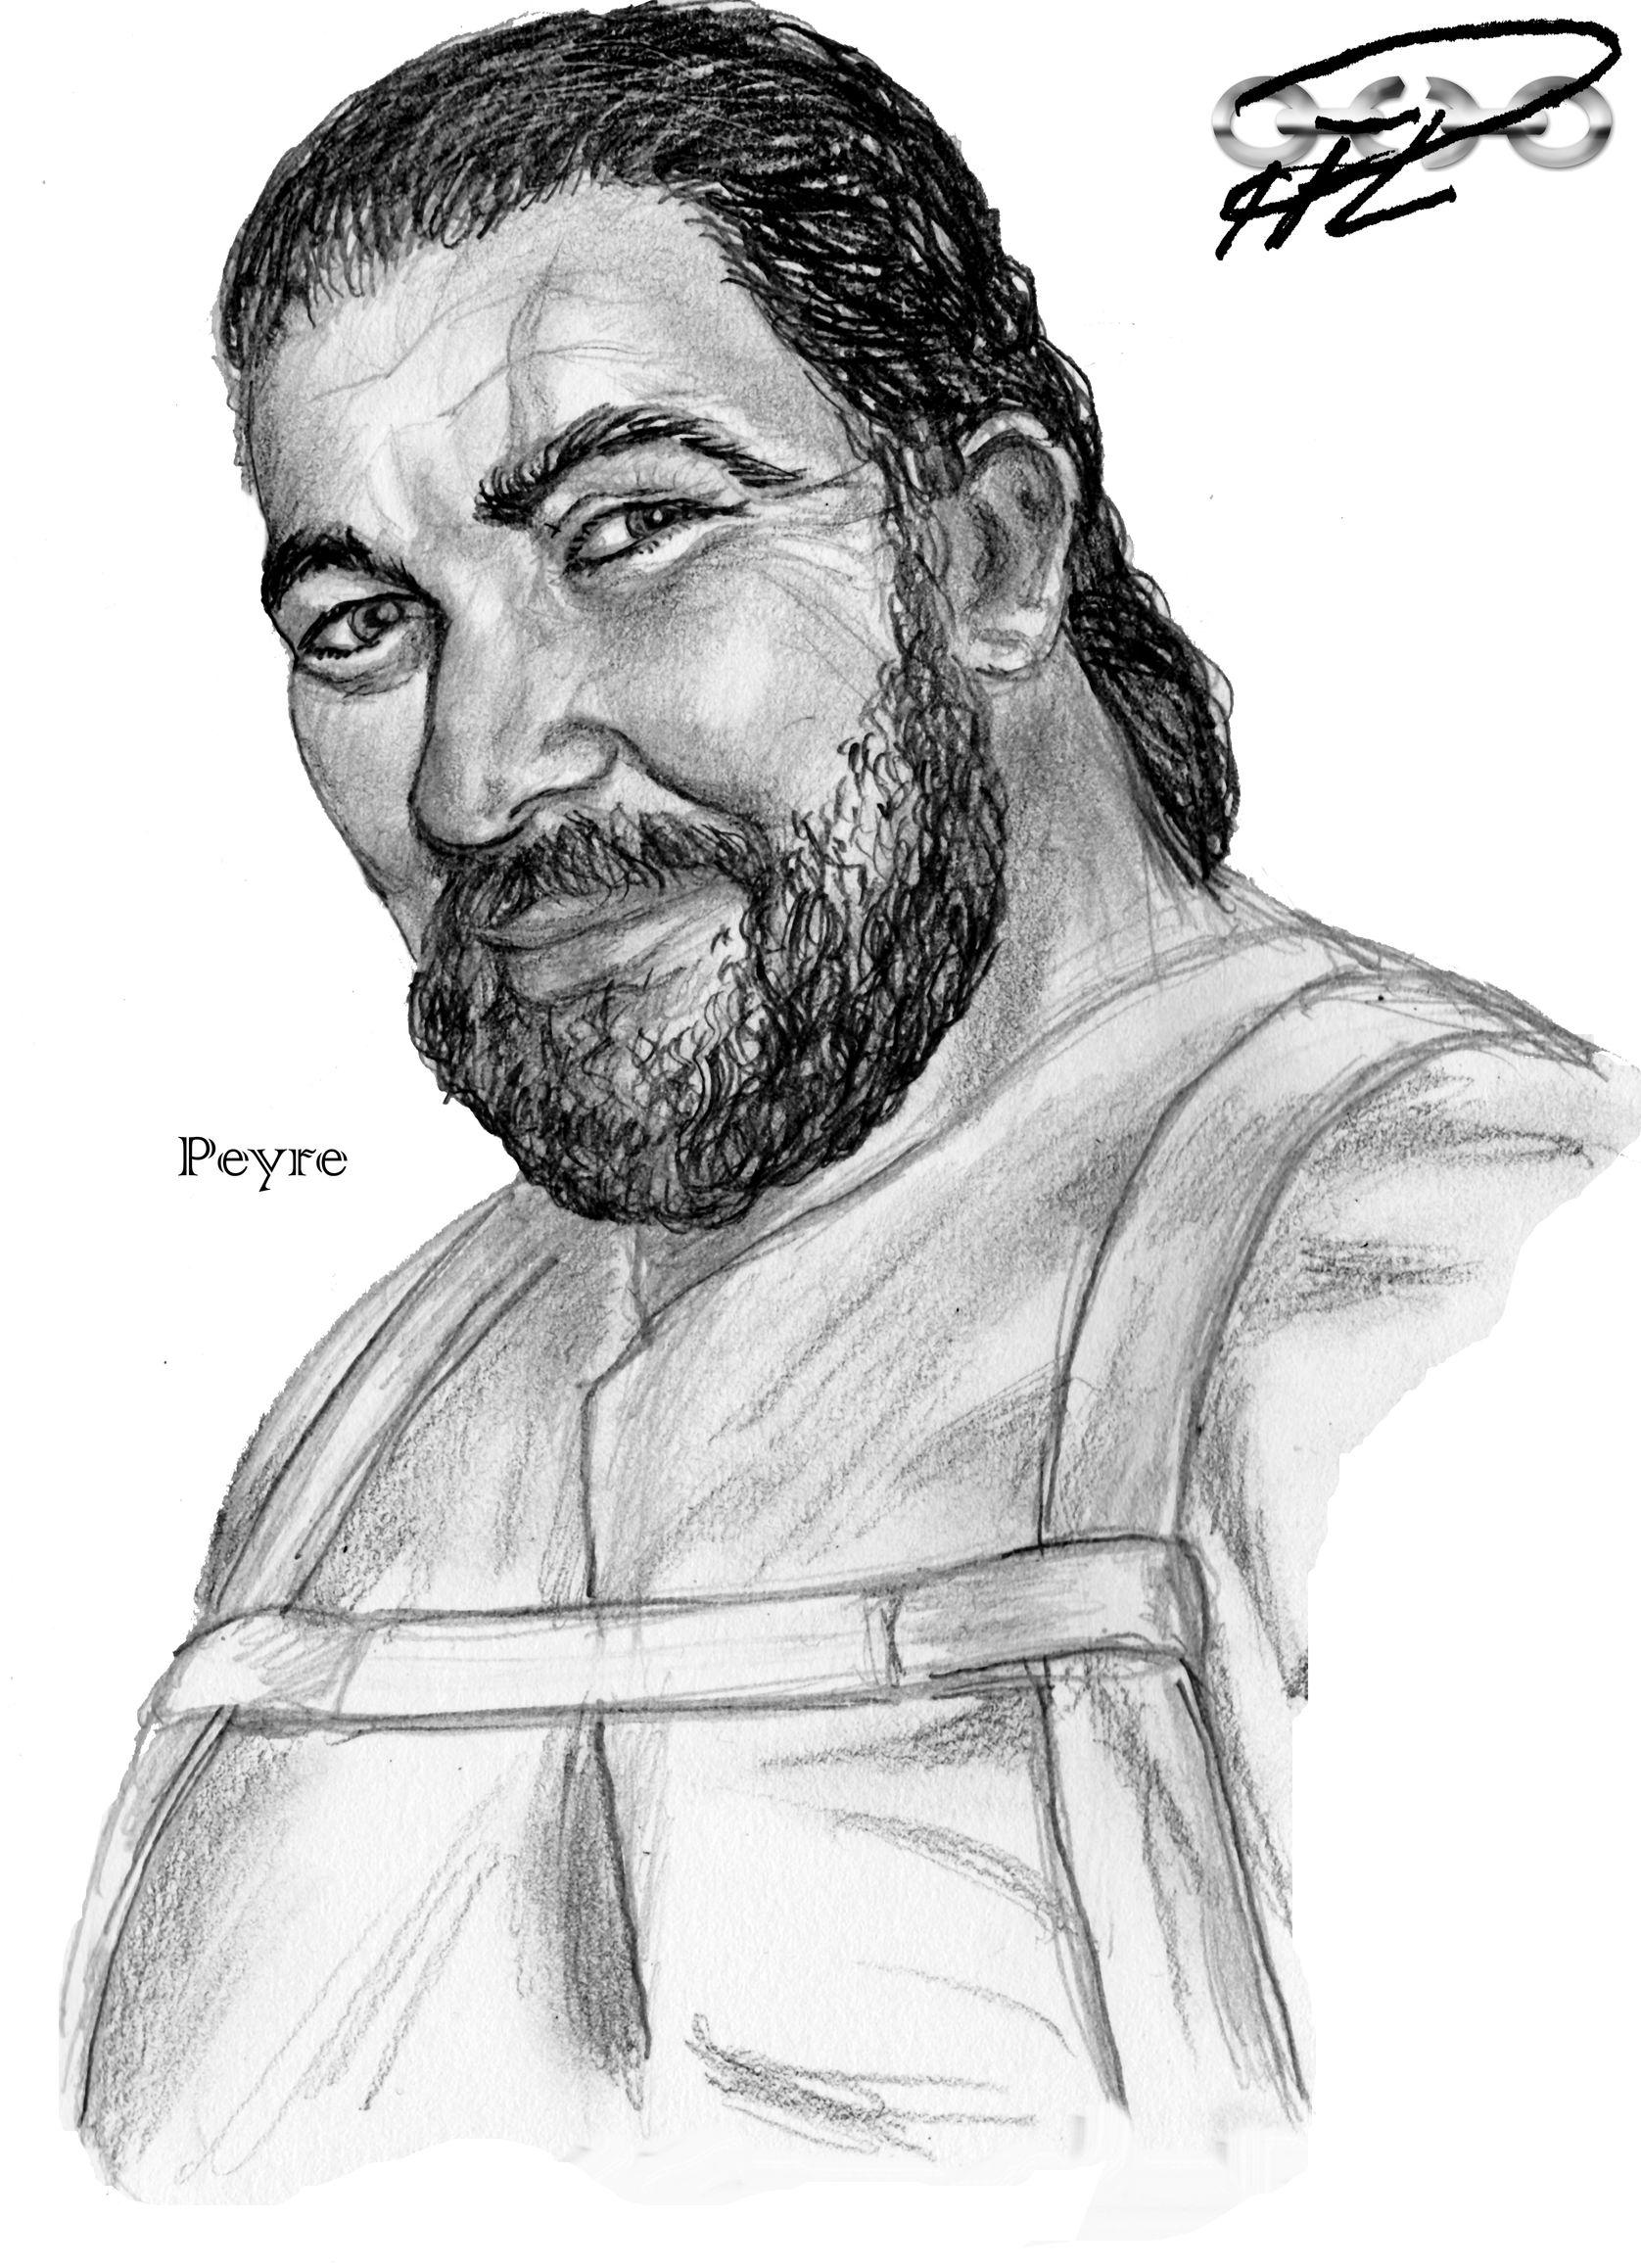 Peyre, legosldat hos Almutamers